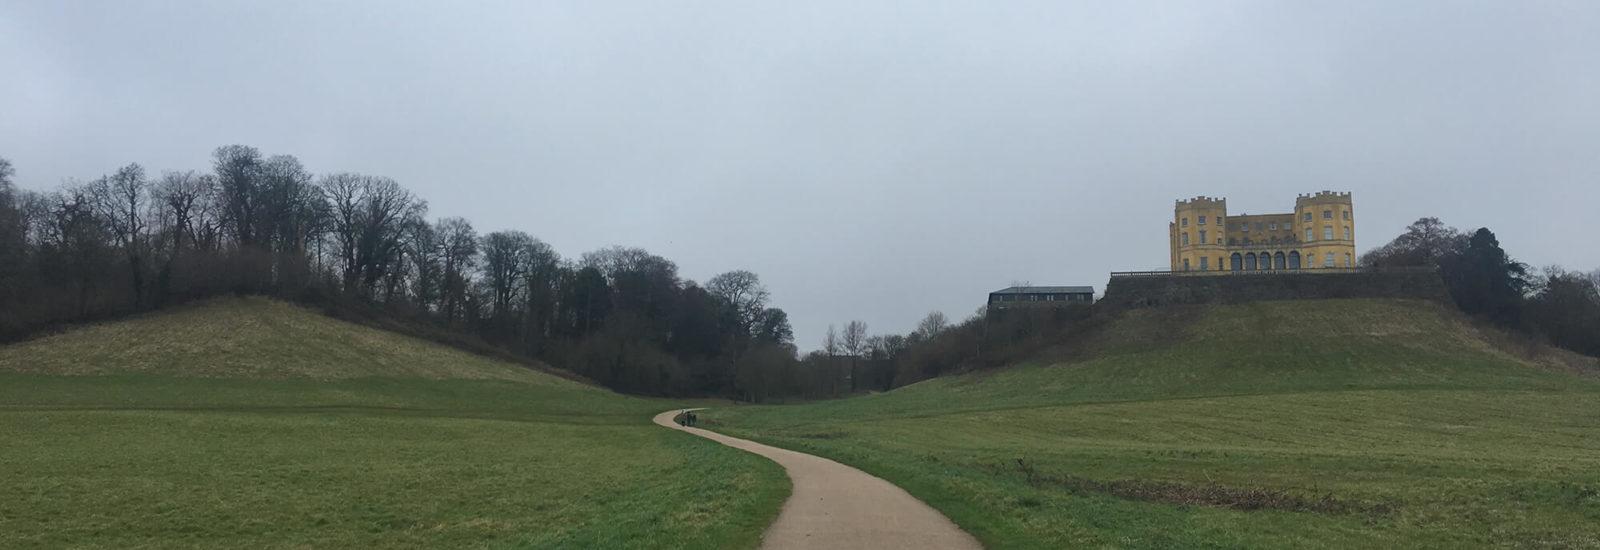 Image of Stoke Park Estate